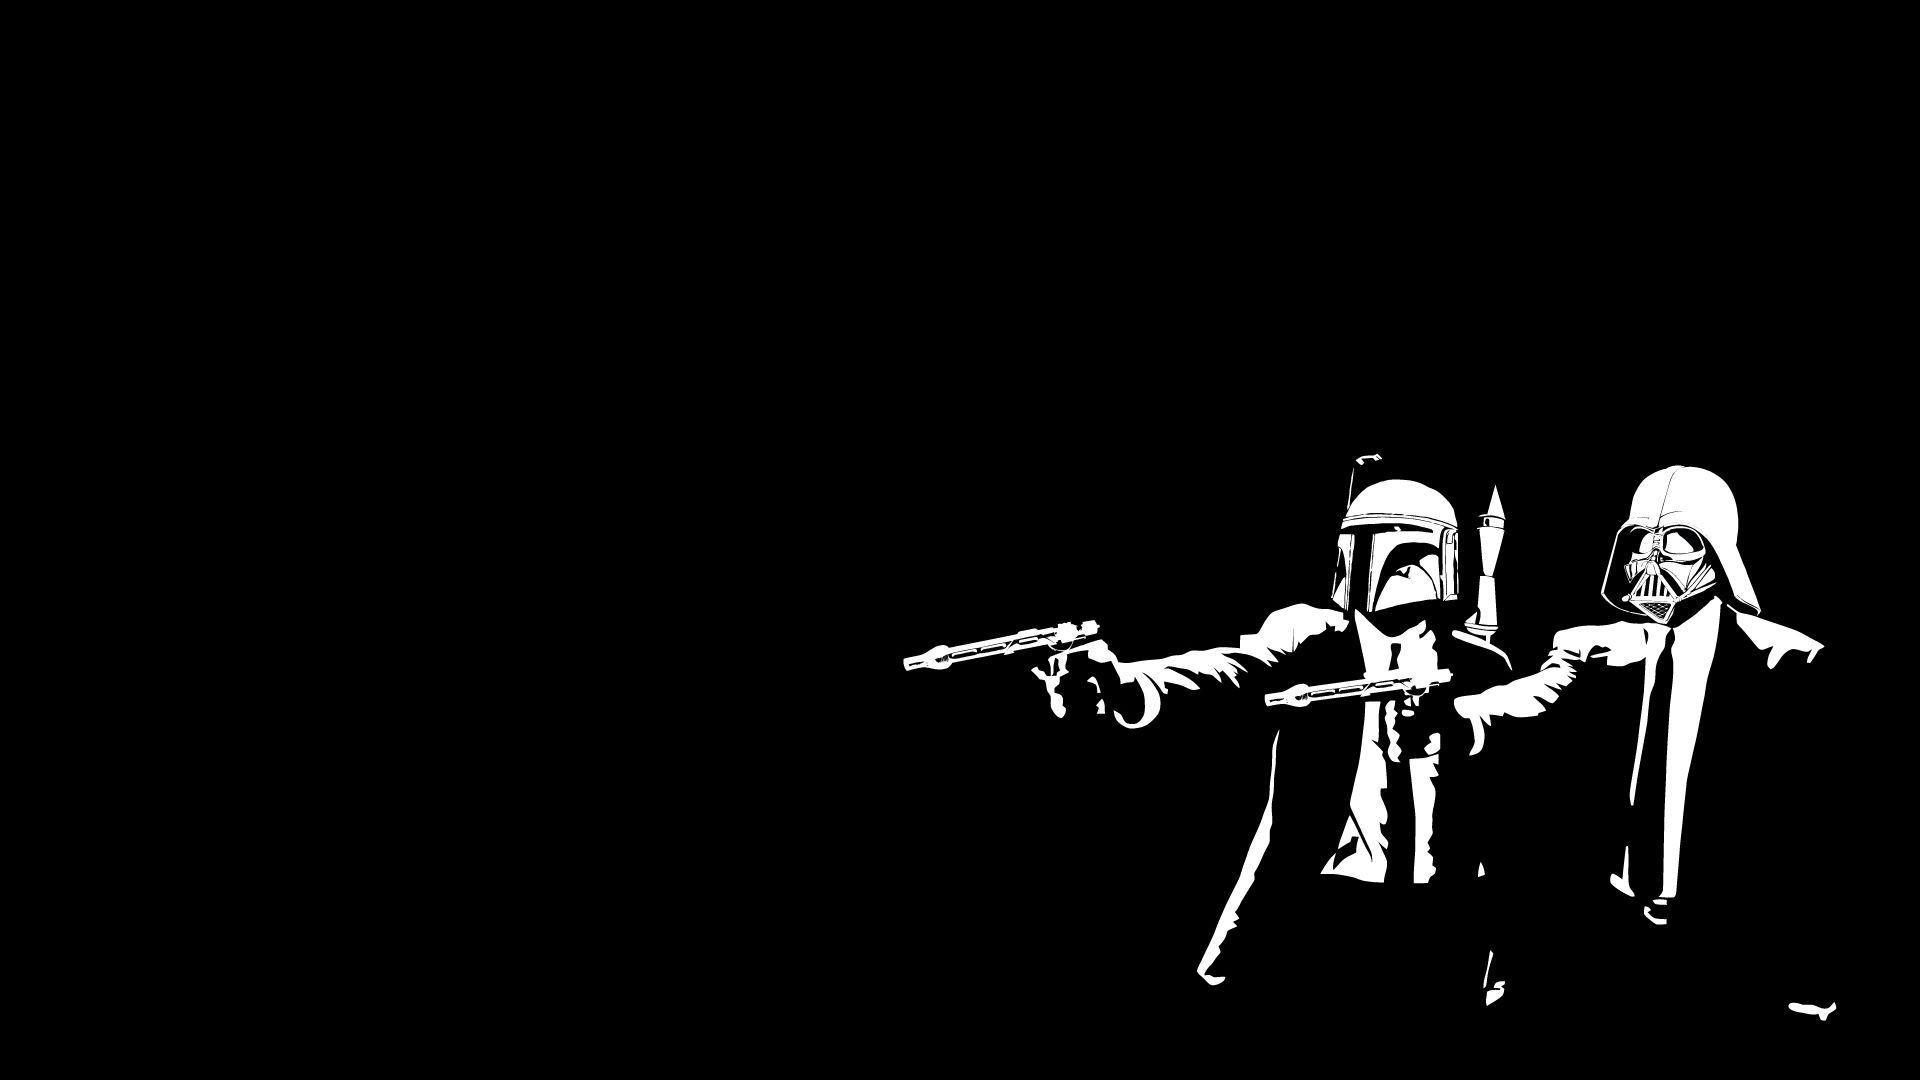 … Movie Star Wars Wallpaper 1080p Wallpapers …